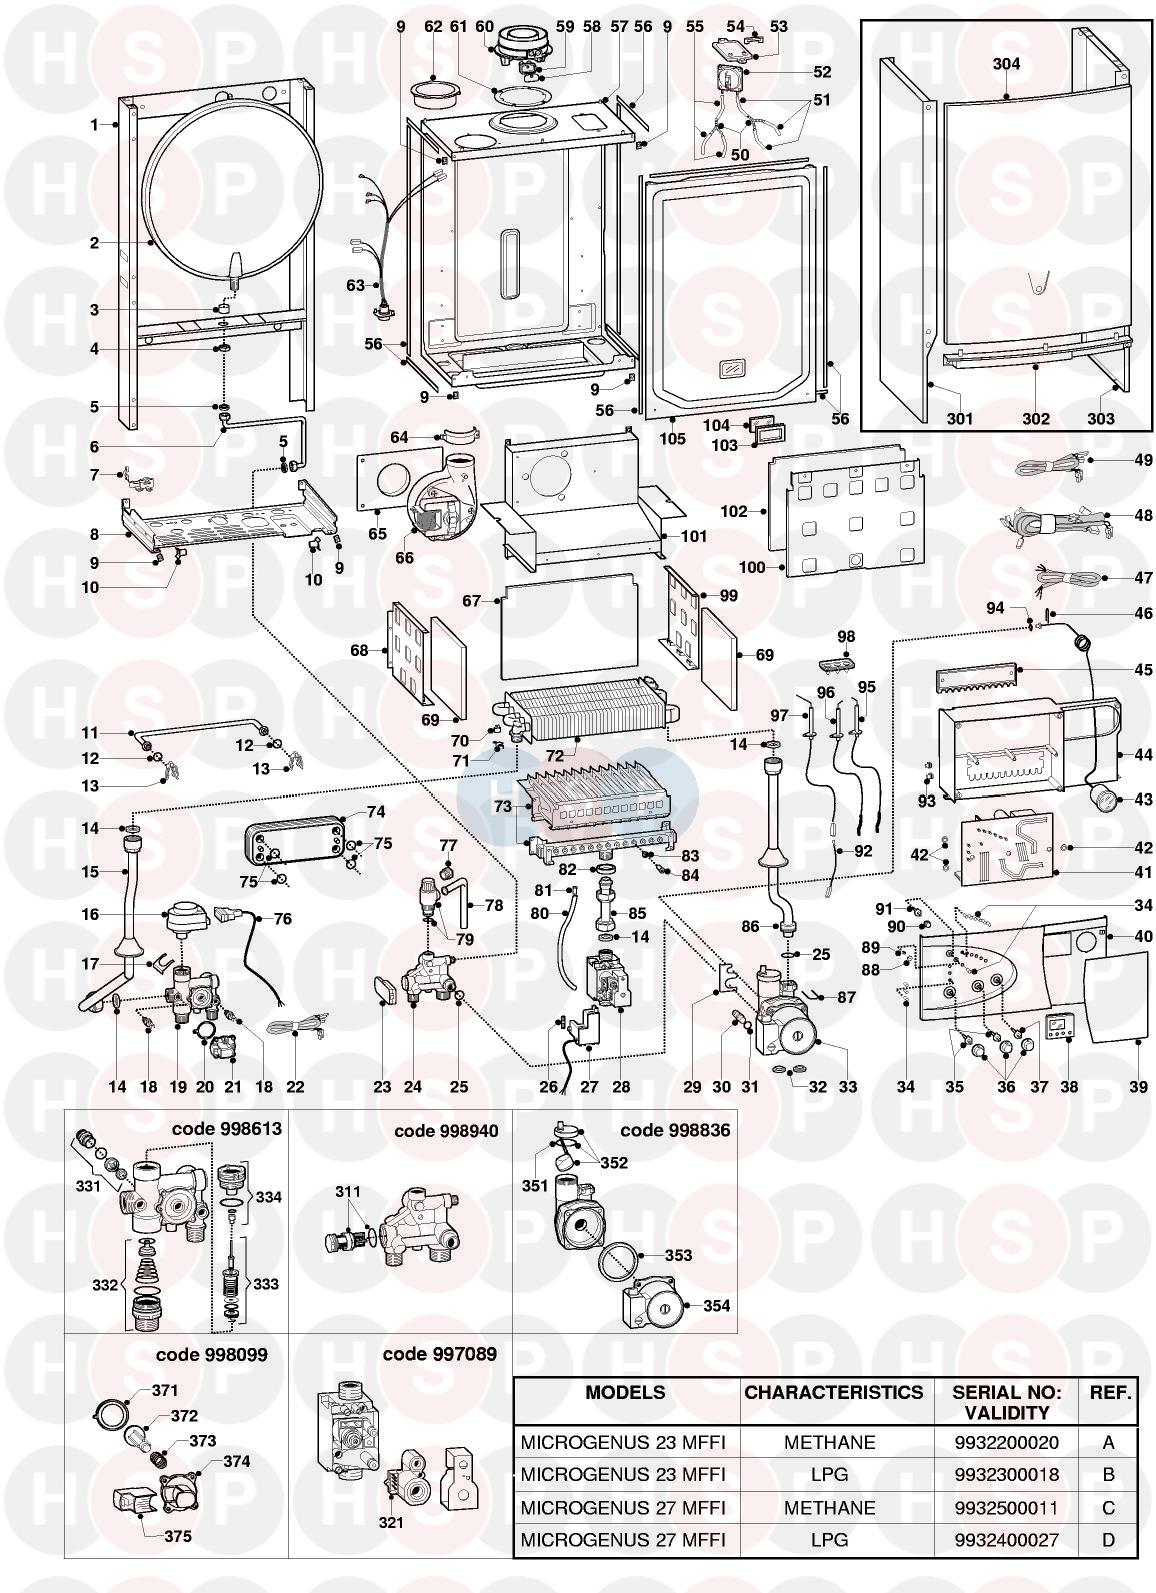 Ariston MICROGENUS 23 MFFI EDITION1 Appliance Diagram